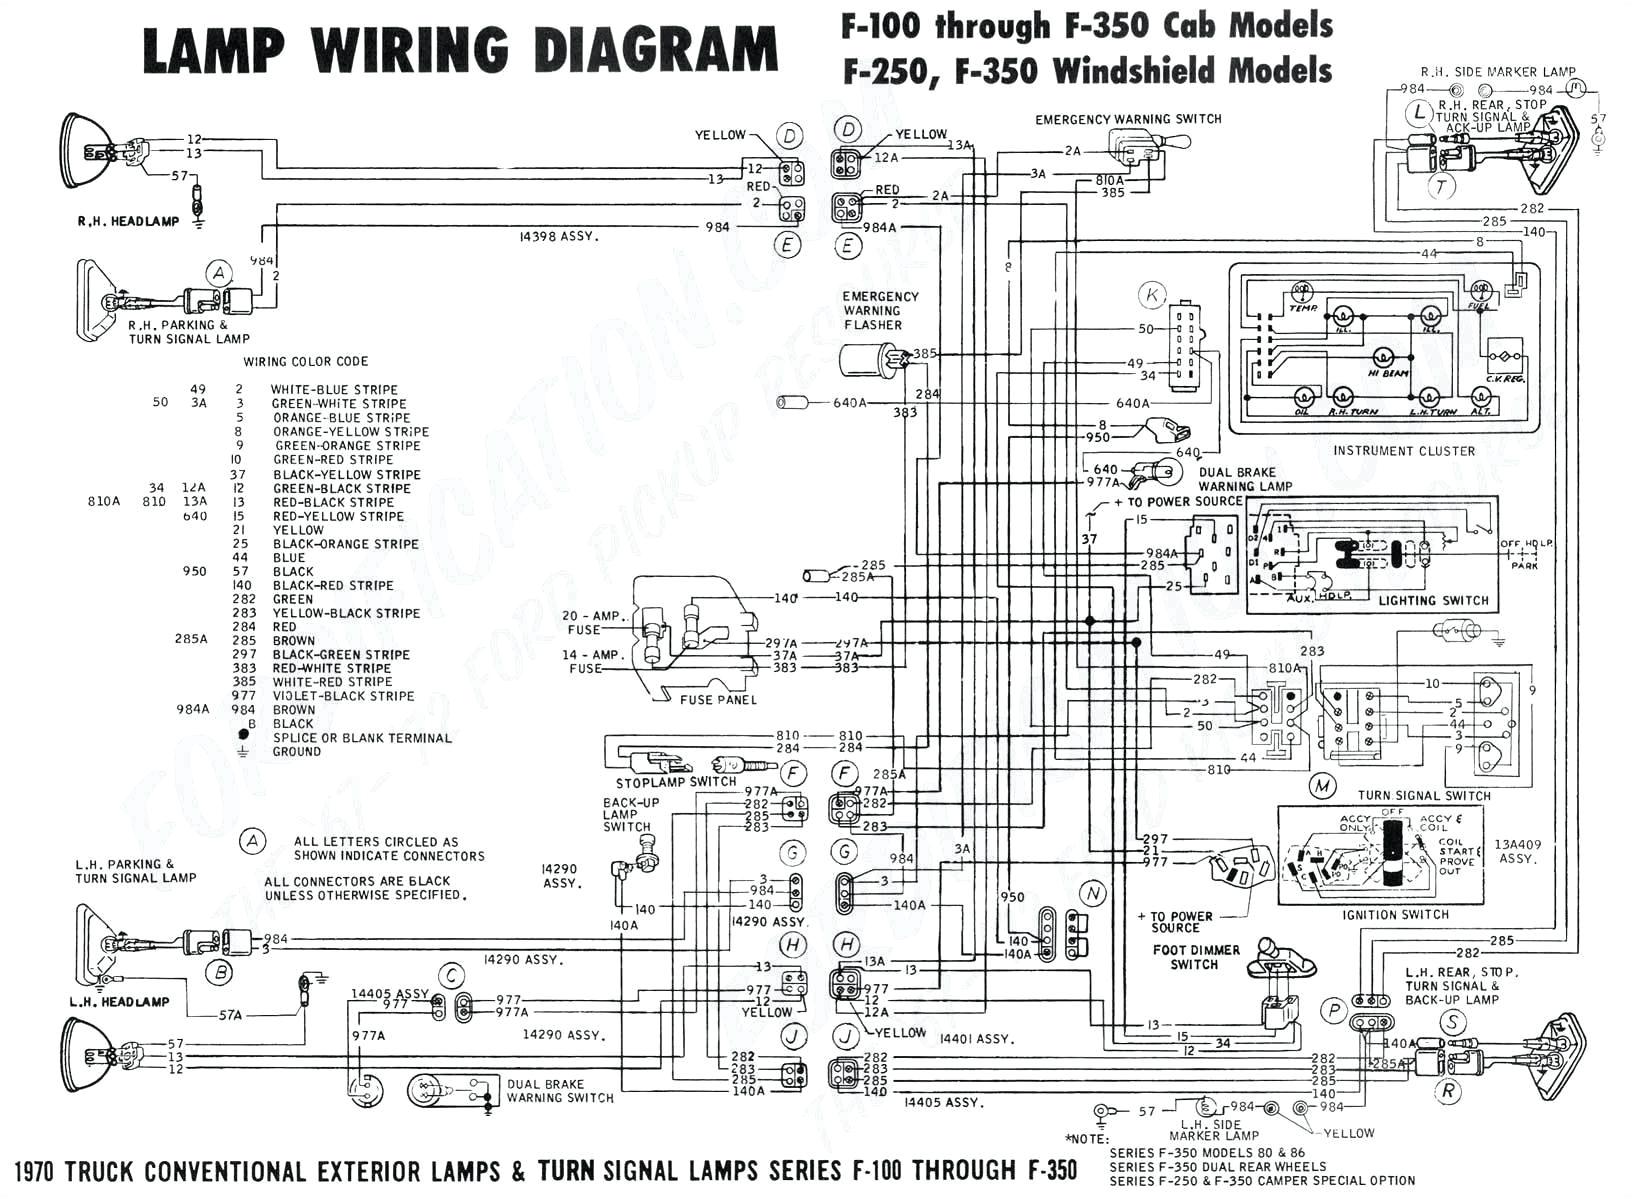 Freightliner Starter Wiring Diagram Wiring Diagram Freightliner Ambulance Online Manuual Of Wiring Diagram